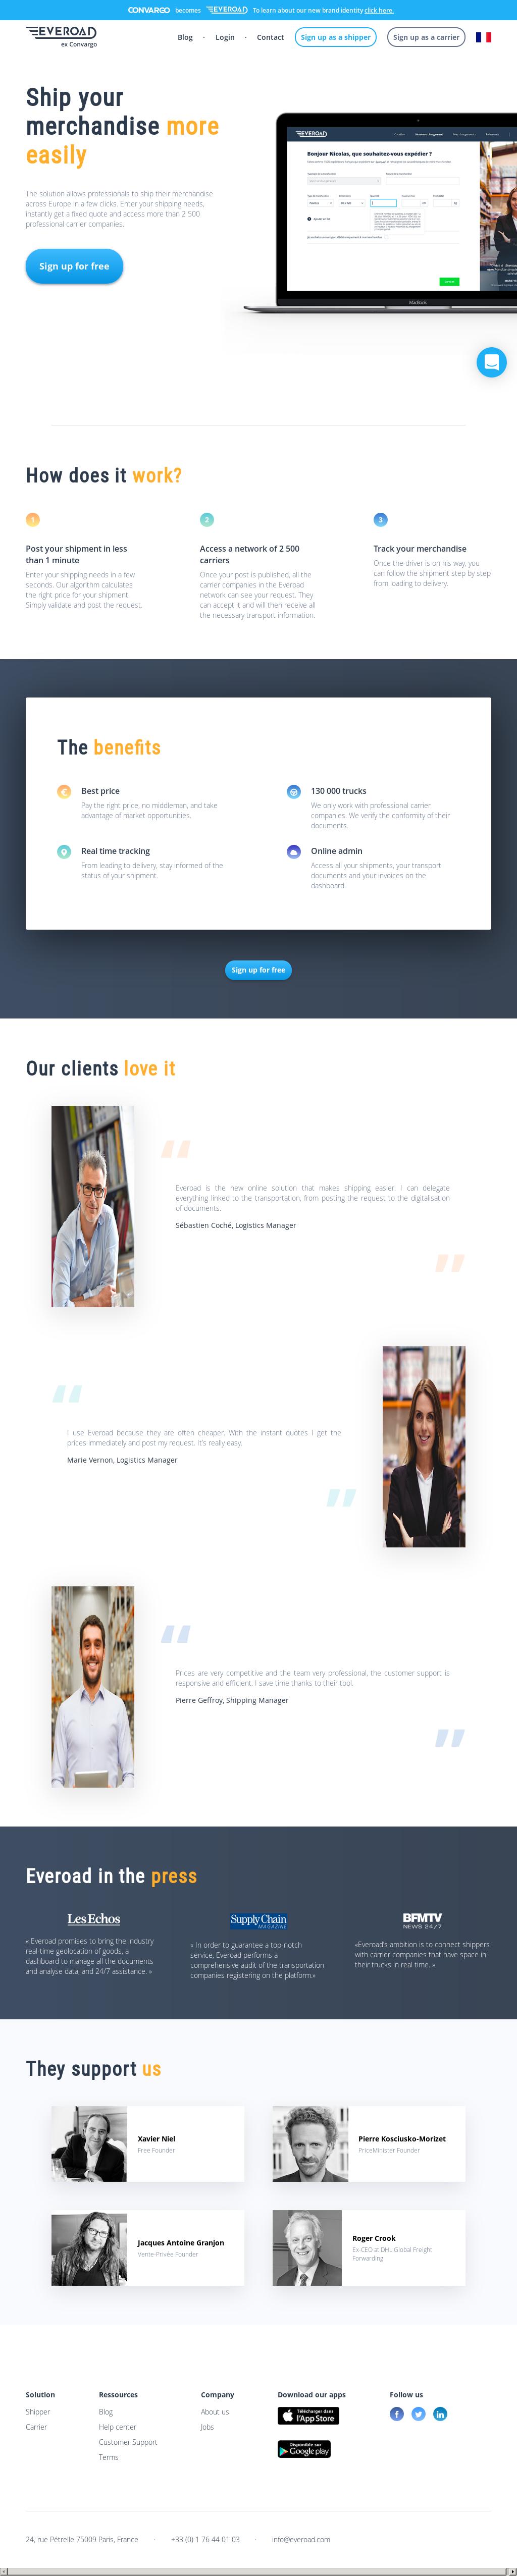 Convargo Competitors, Revenue and Employees - Owler Company